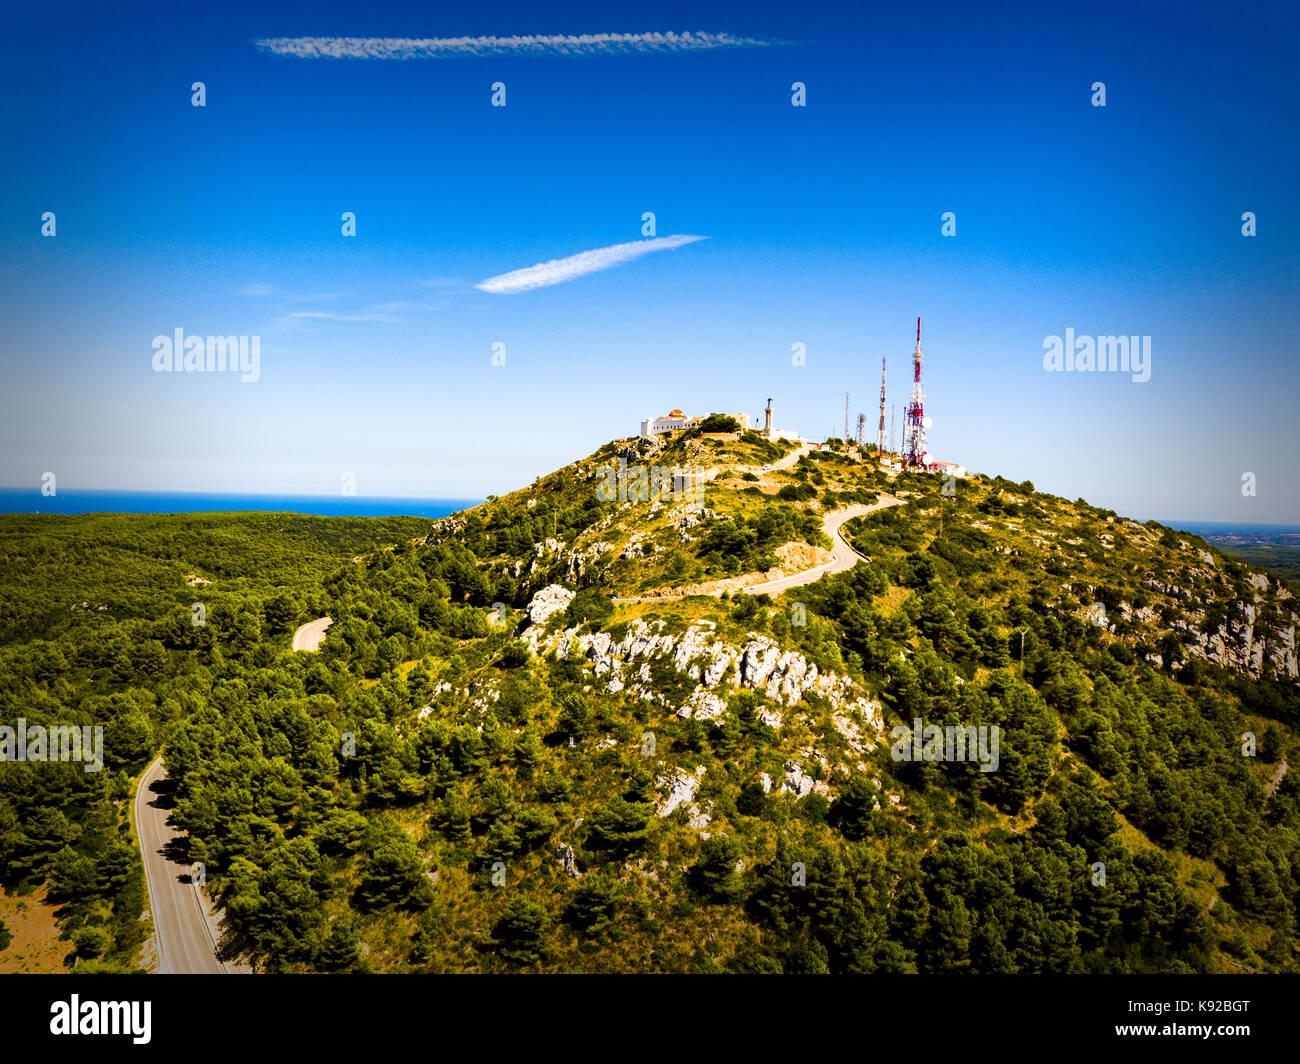 monte-toro-menorca-drone-shot-K92BGT.jpg